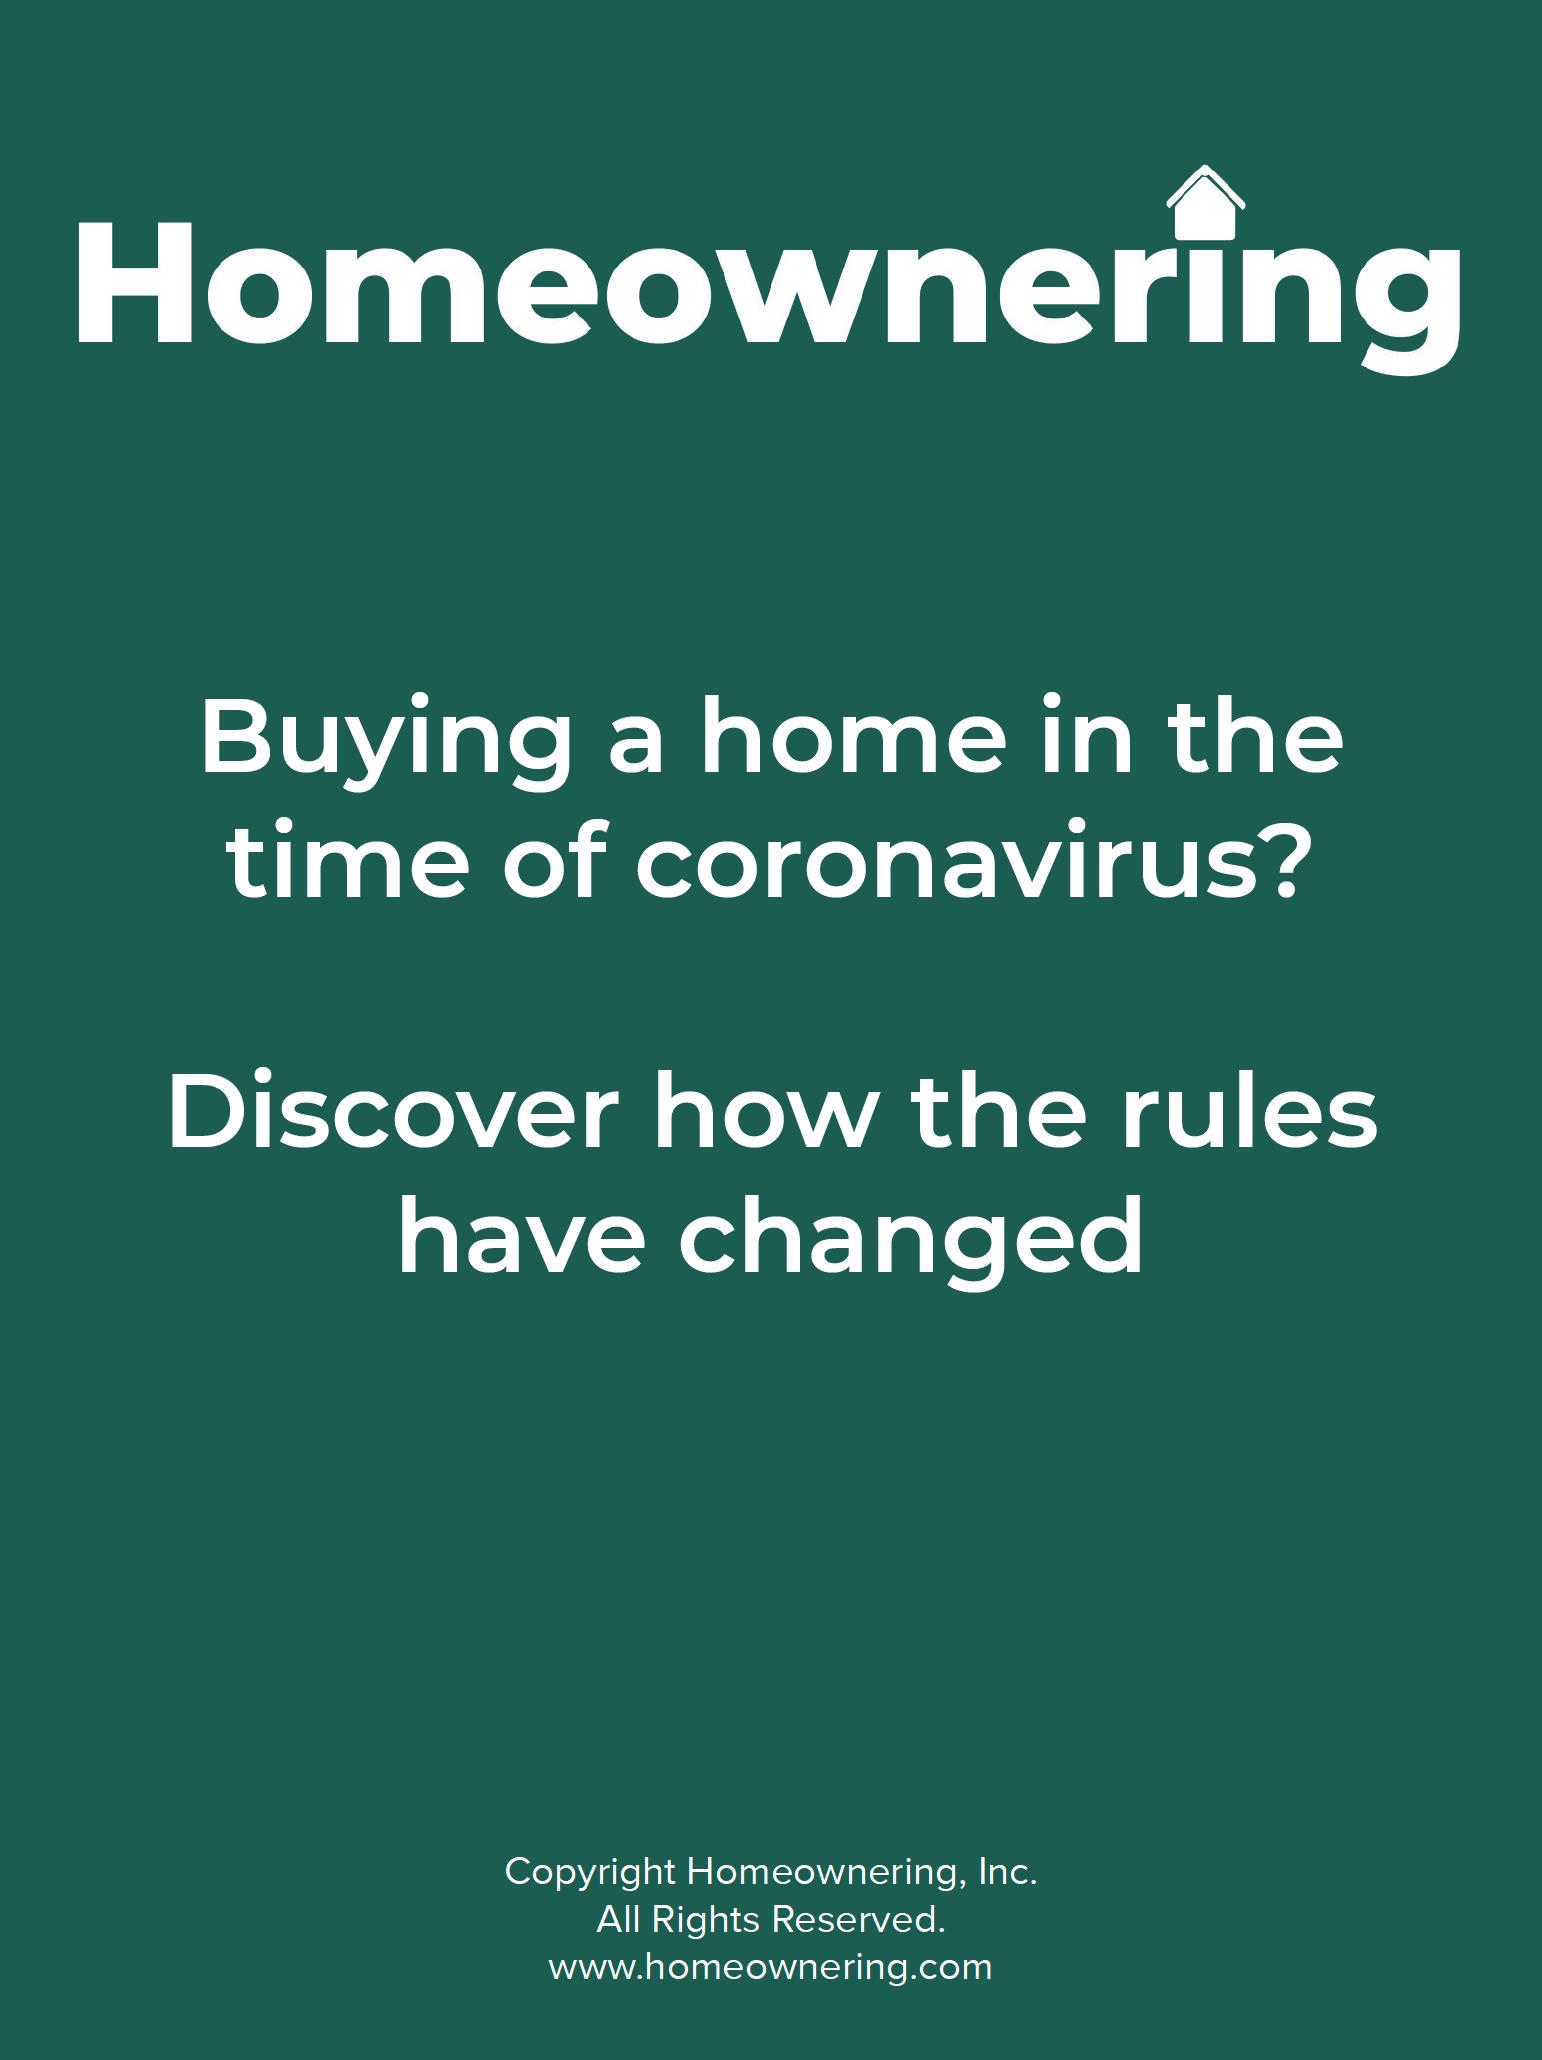 Buying a home during the coronavirus